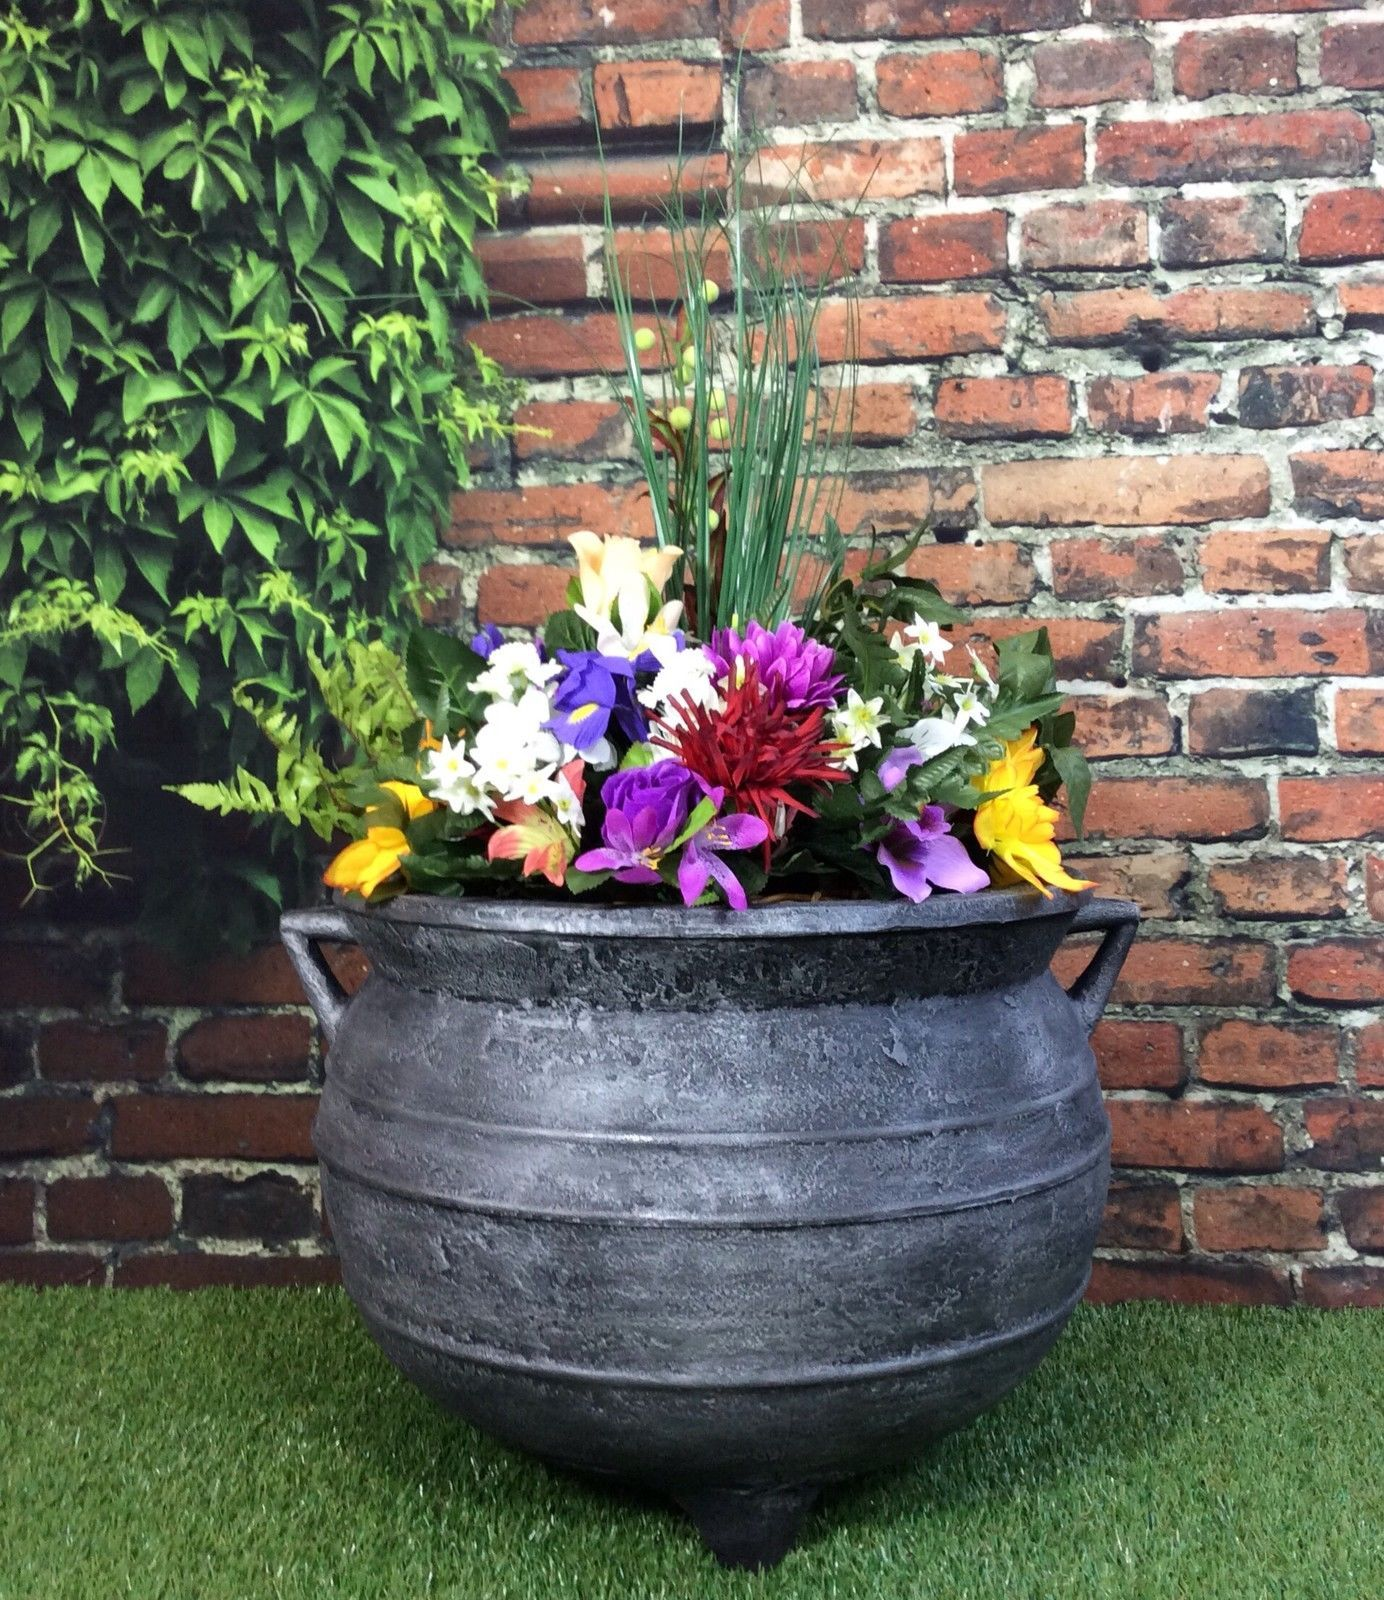 Witches Cauldron Garden Planter 15inch Pewter Patio Flower Pot